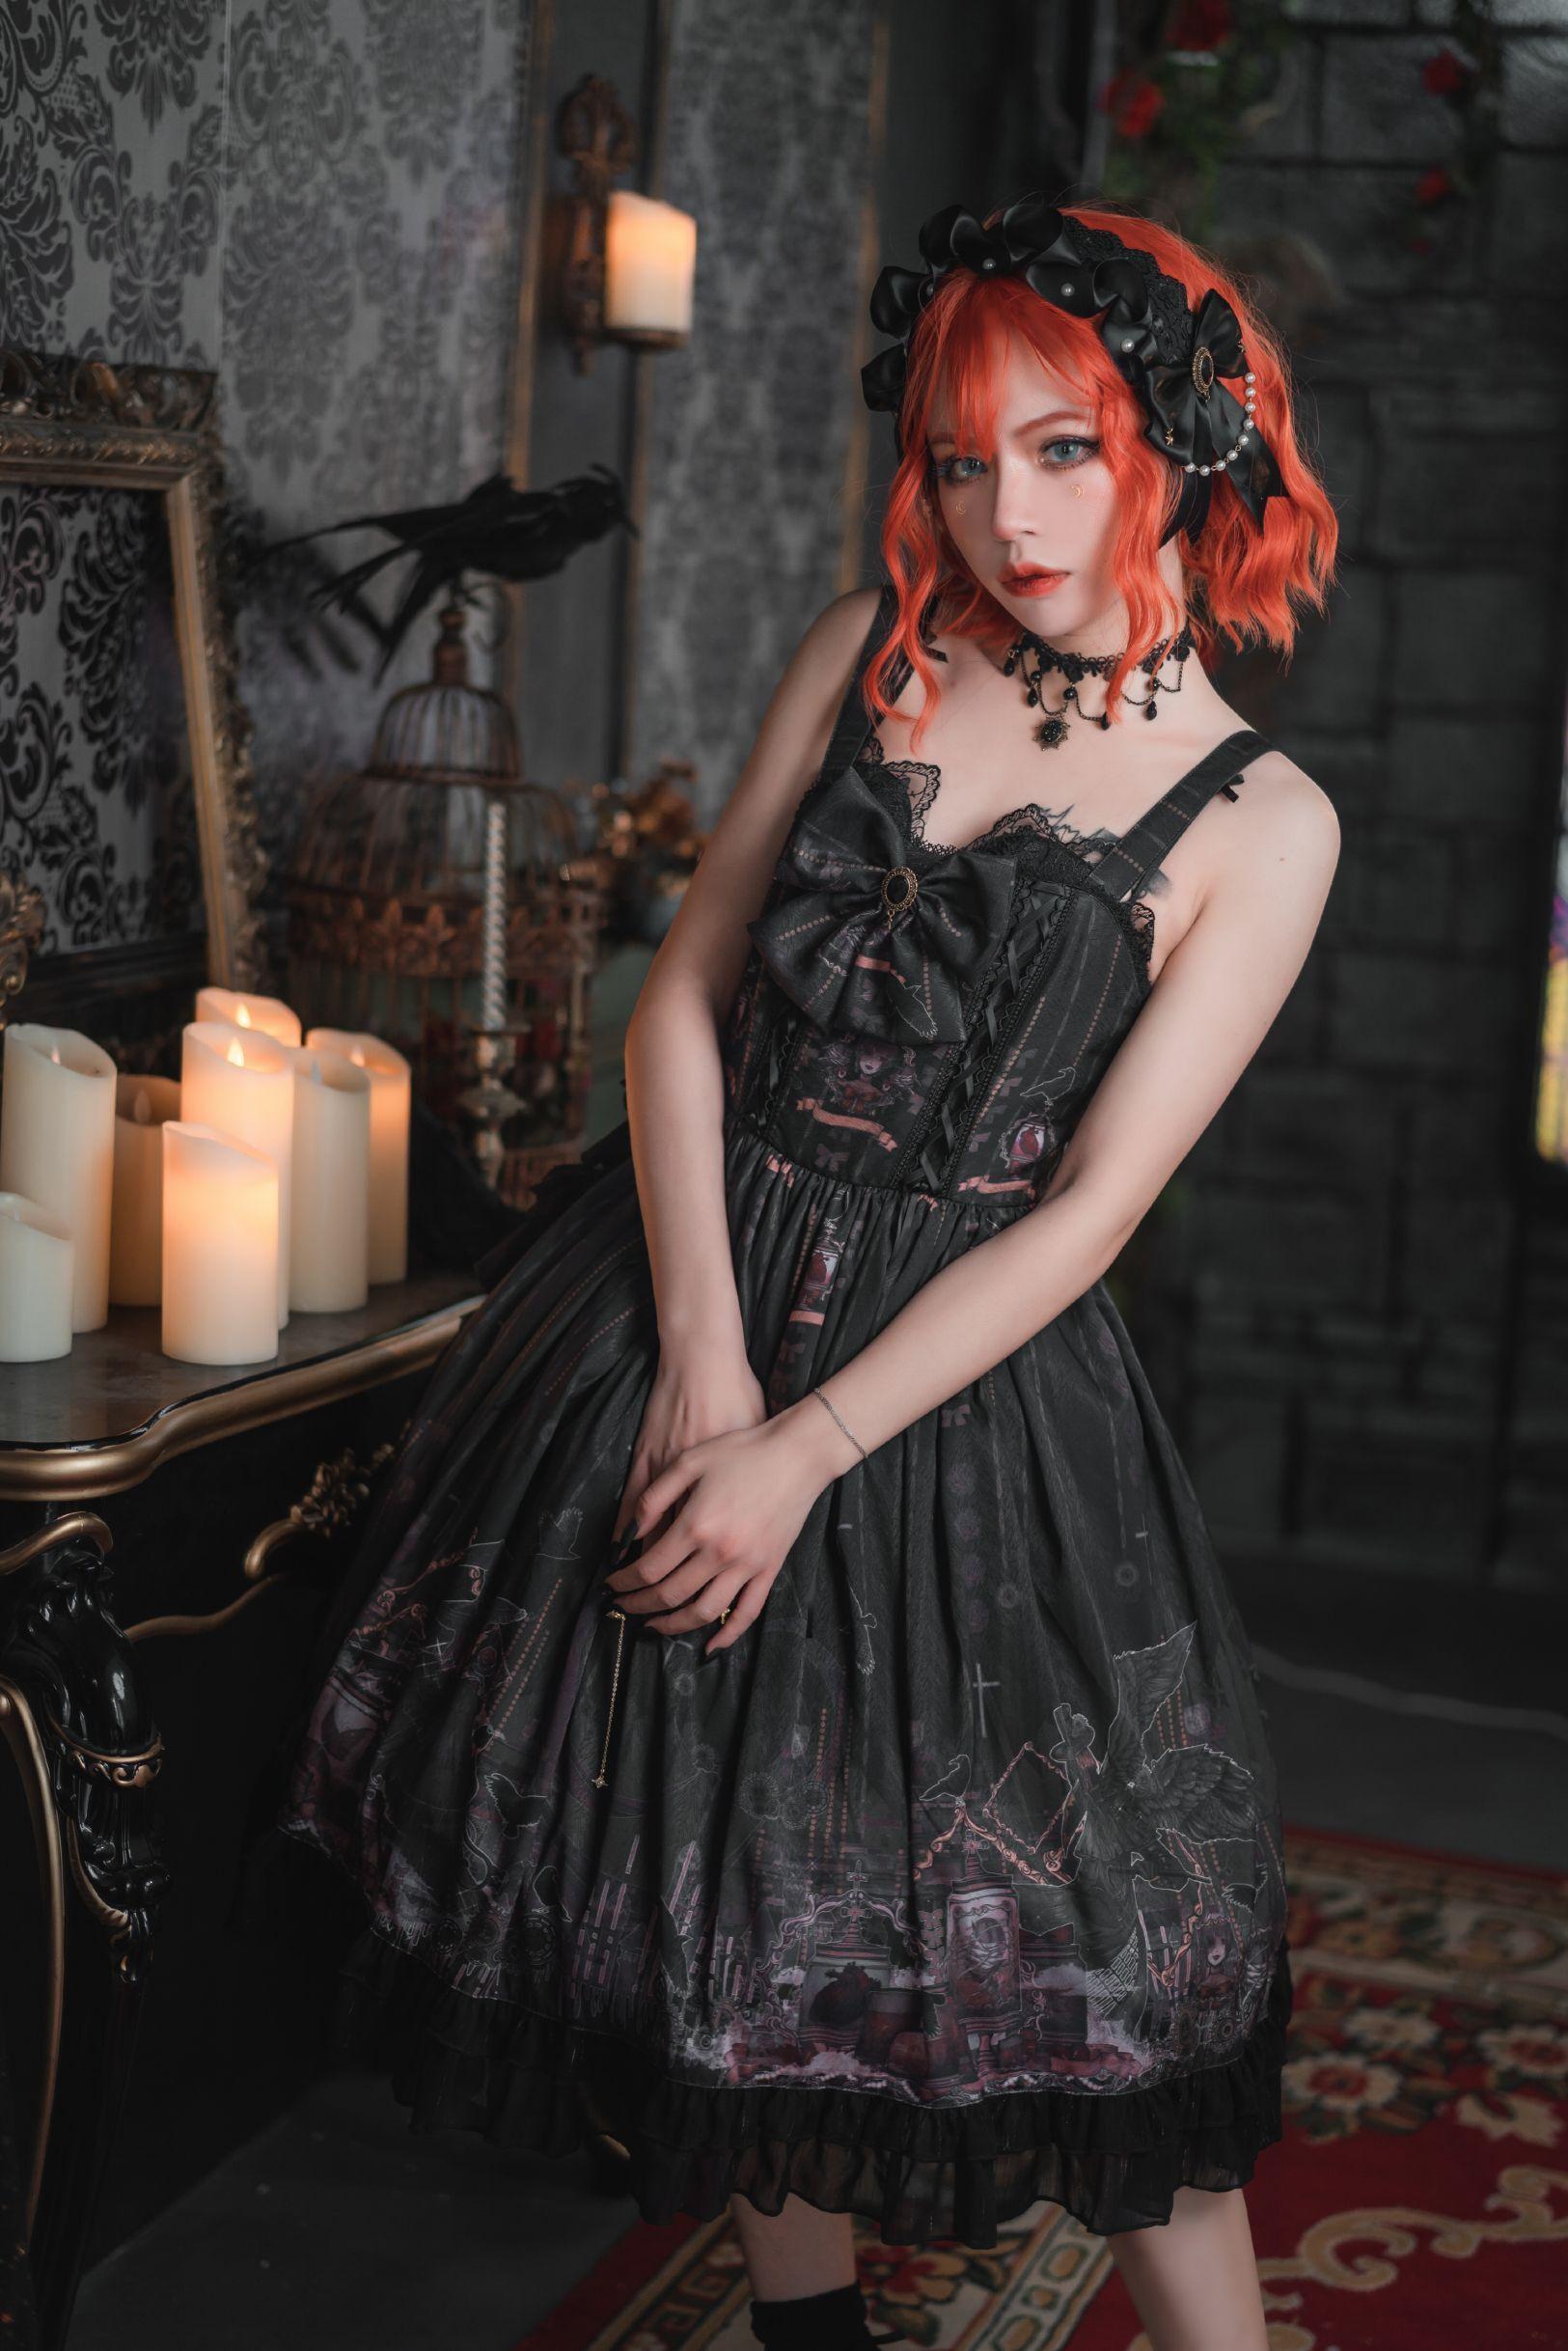 [deposit] ten og taboo bottle Lolita original dark wind suspender skirt small high waist jsk Lolita